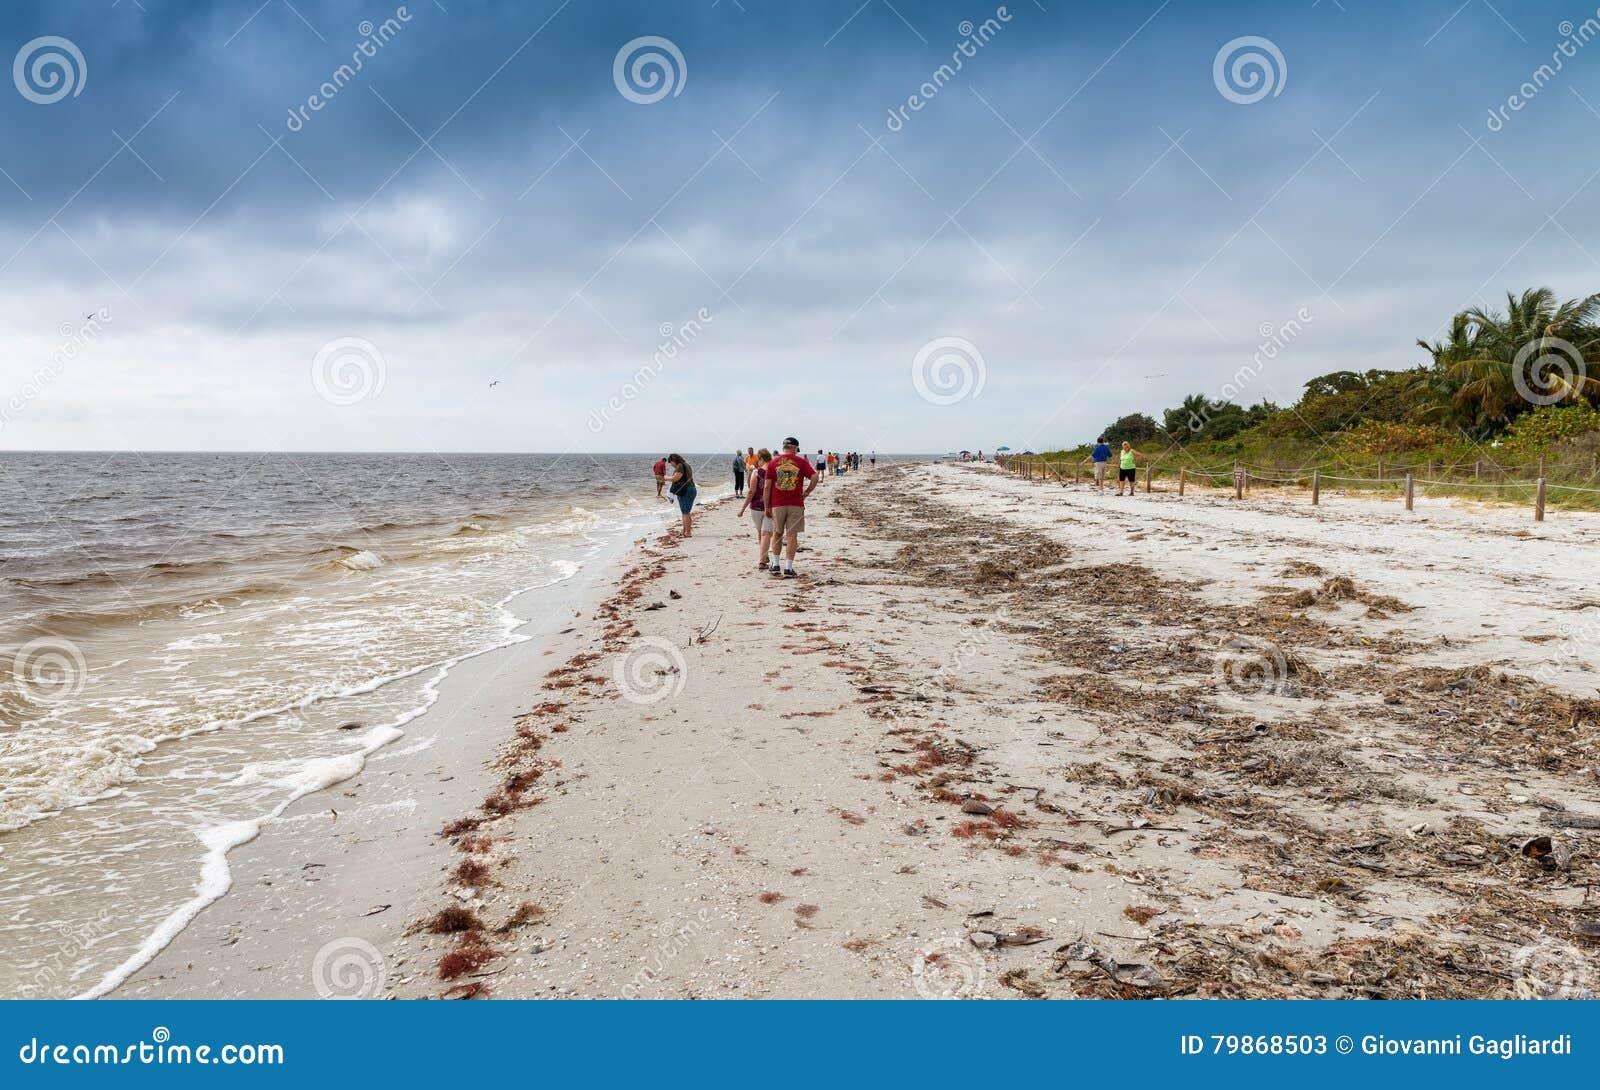 SANIBEL, FL - FEBRUARY 2016: Captiva Island beach with tourists.